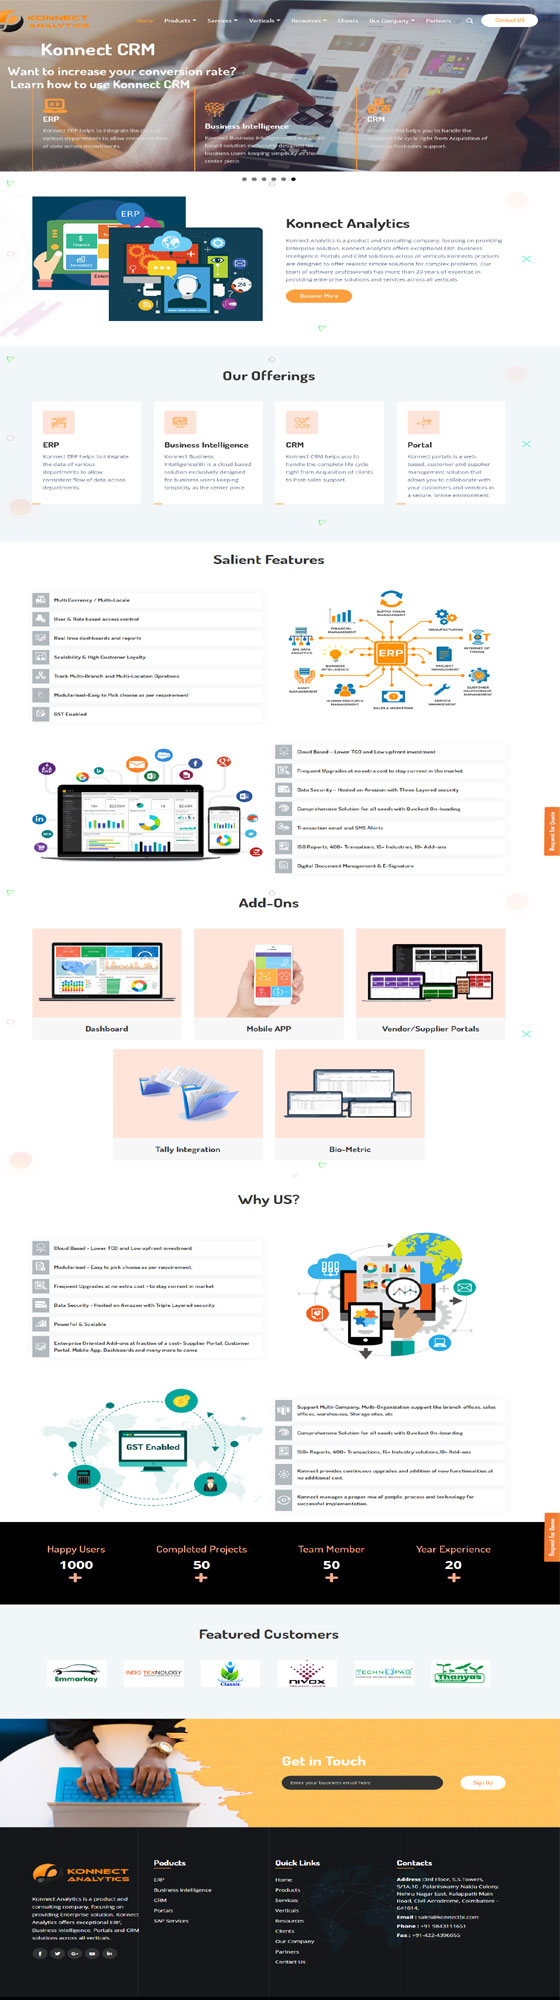 coimbatore web design companies